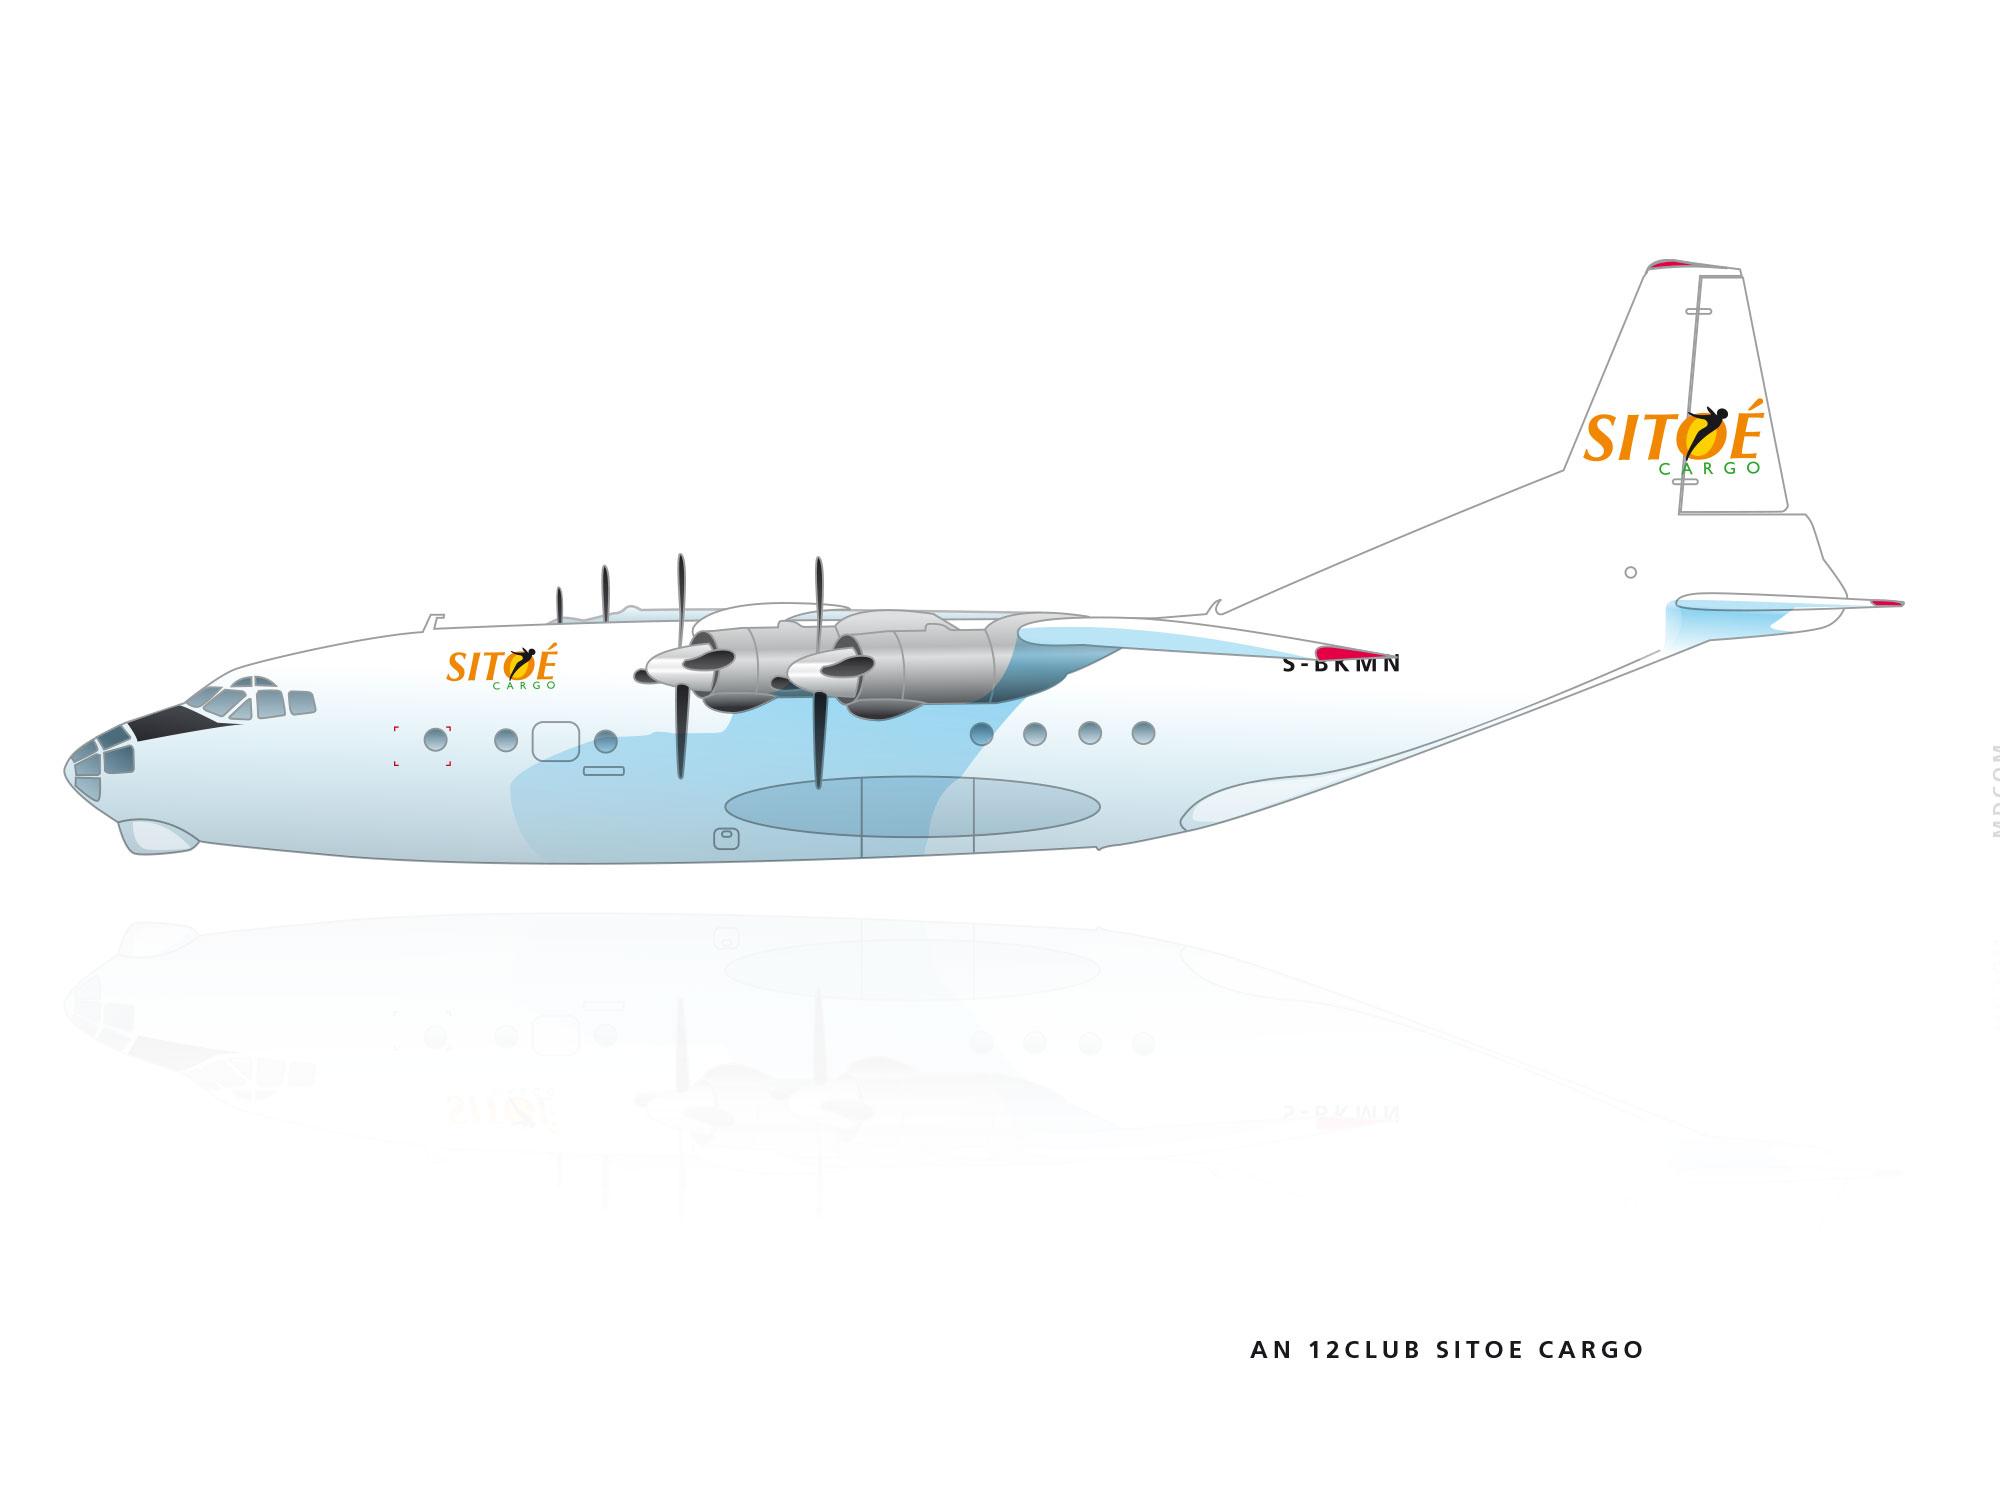 avion cargo AN12 club